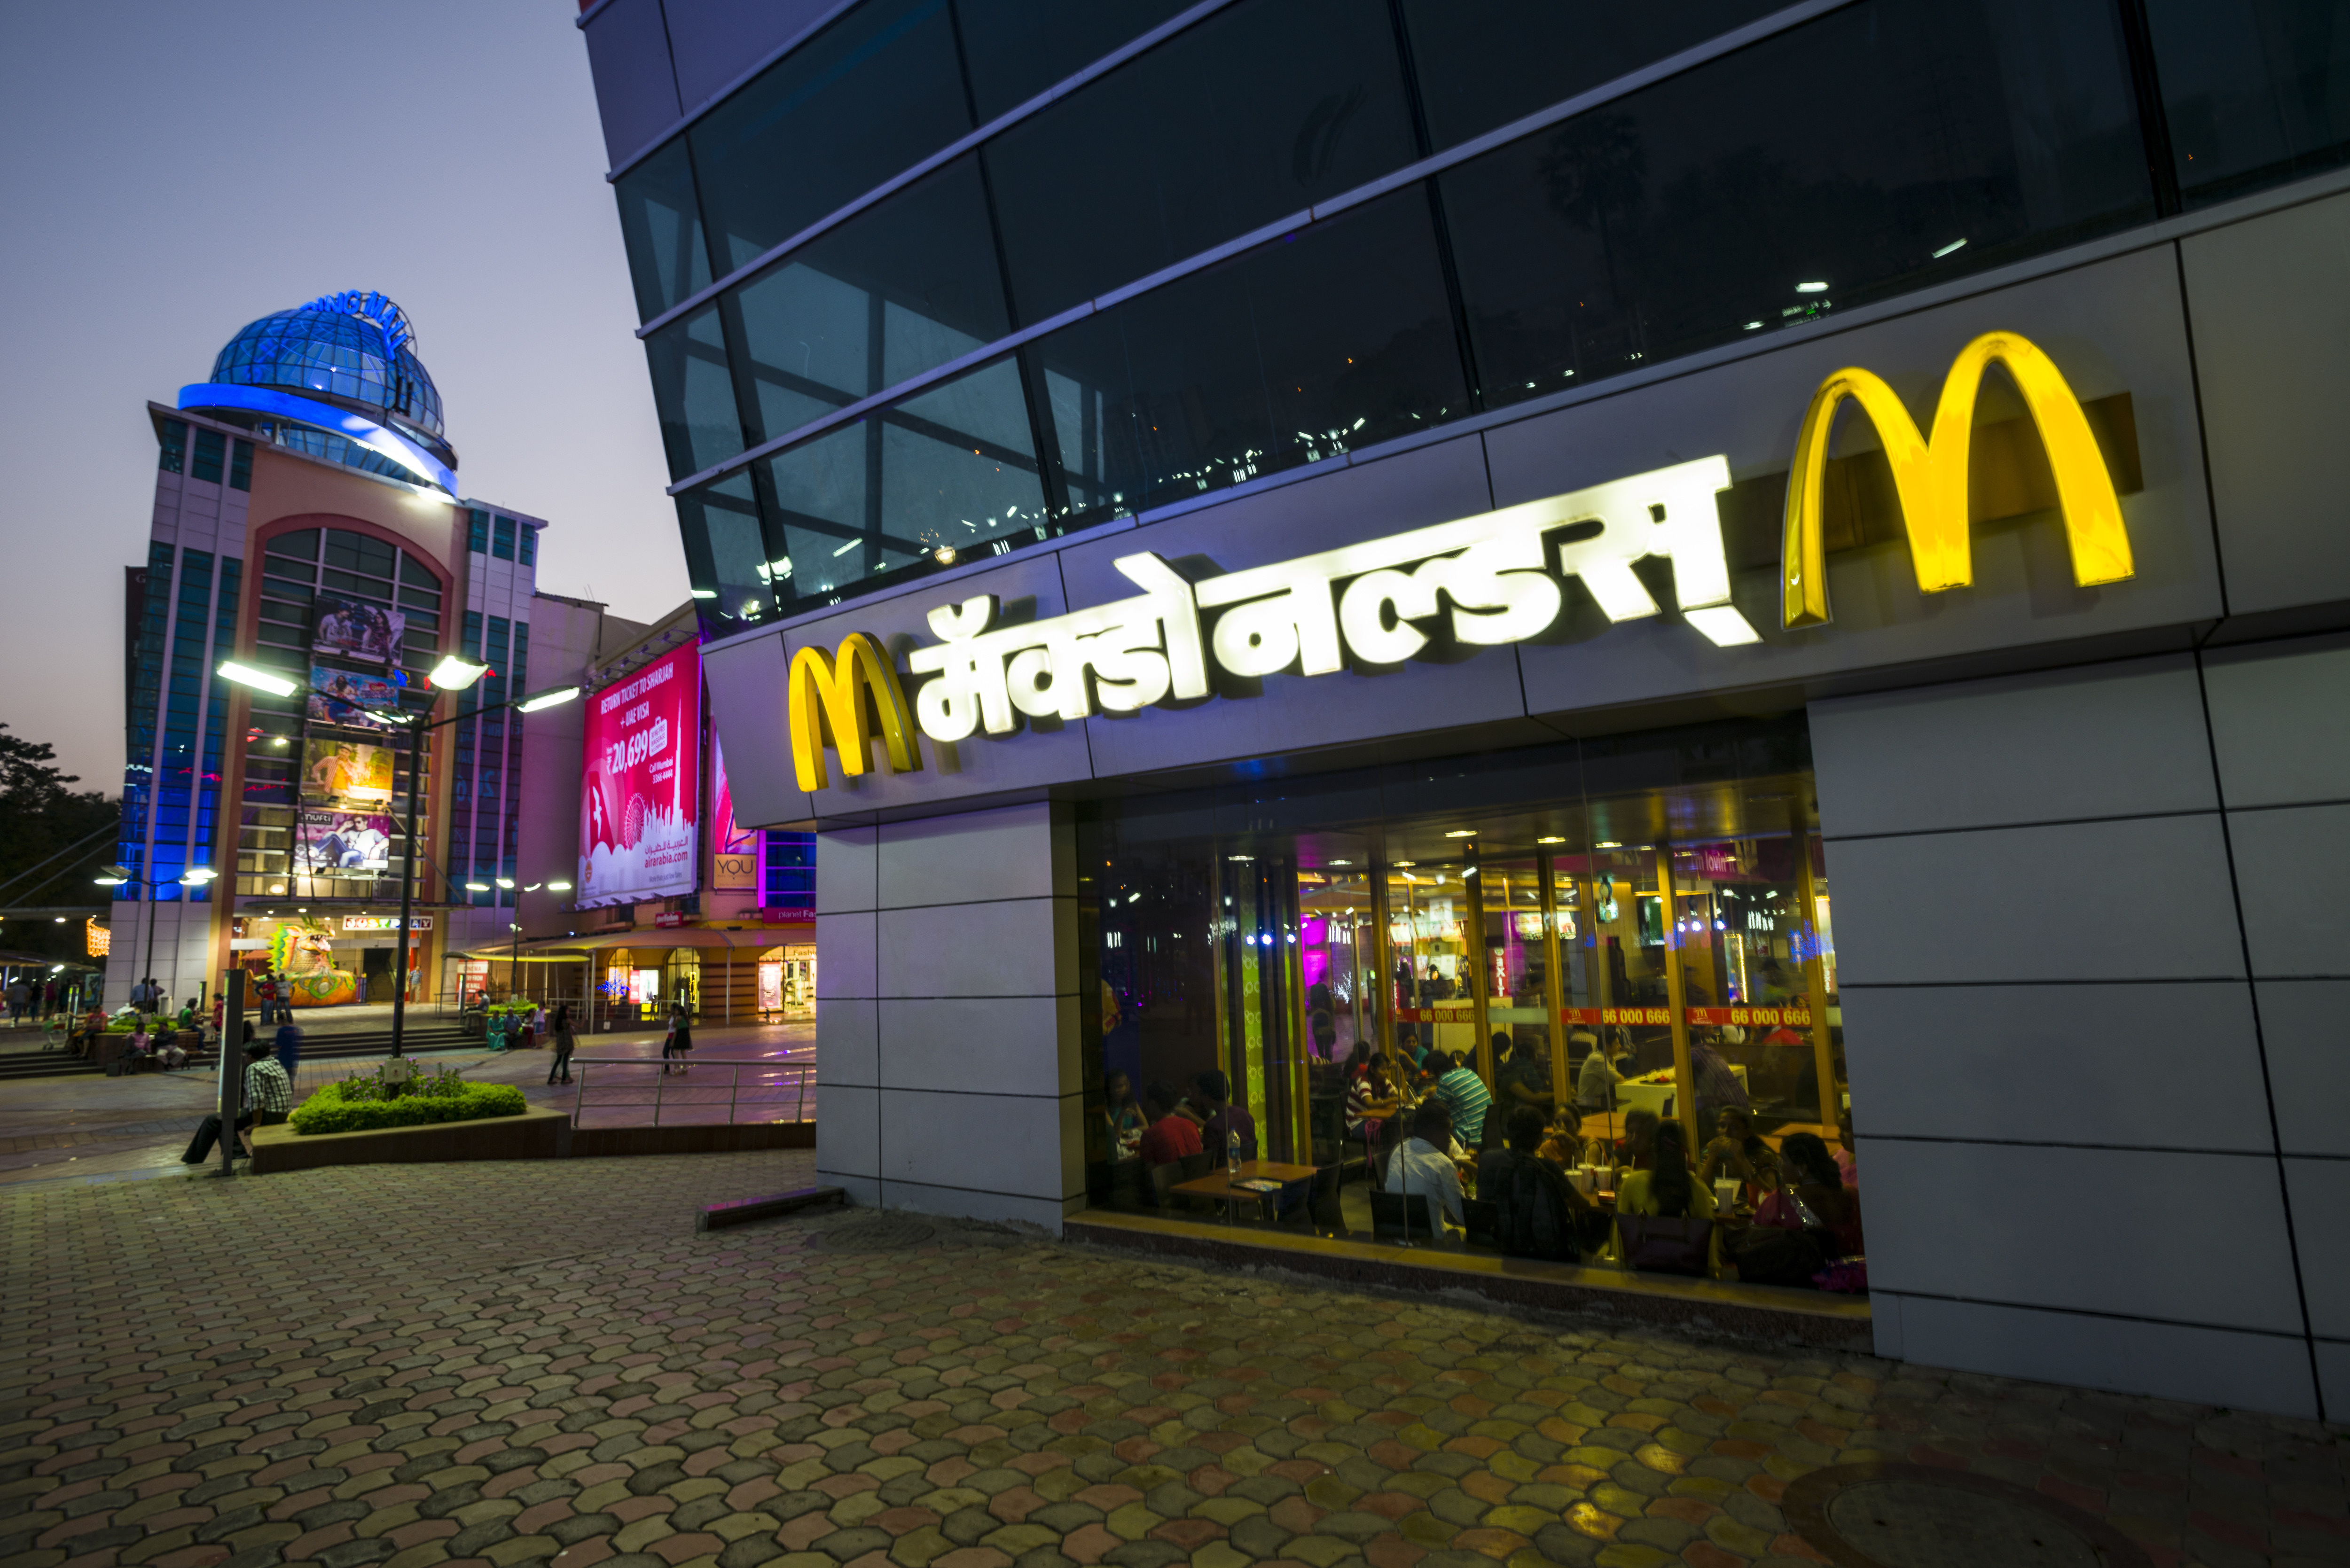 Photograph of McDonalds